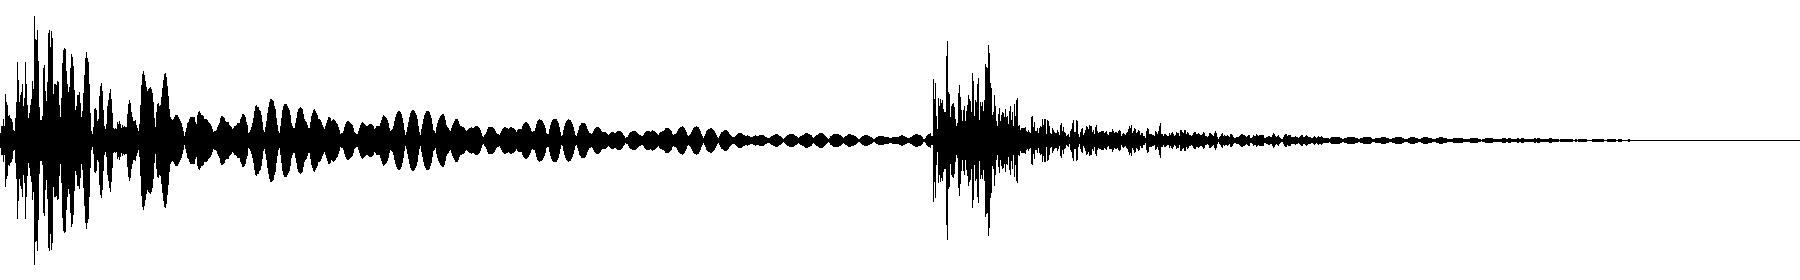 arab percussion loop 7